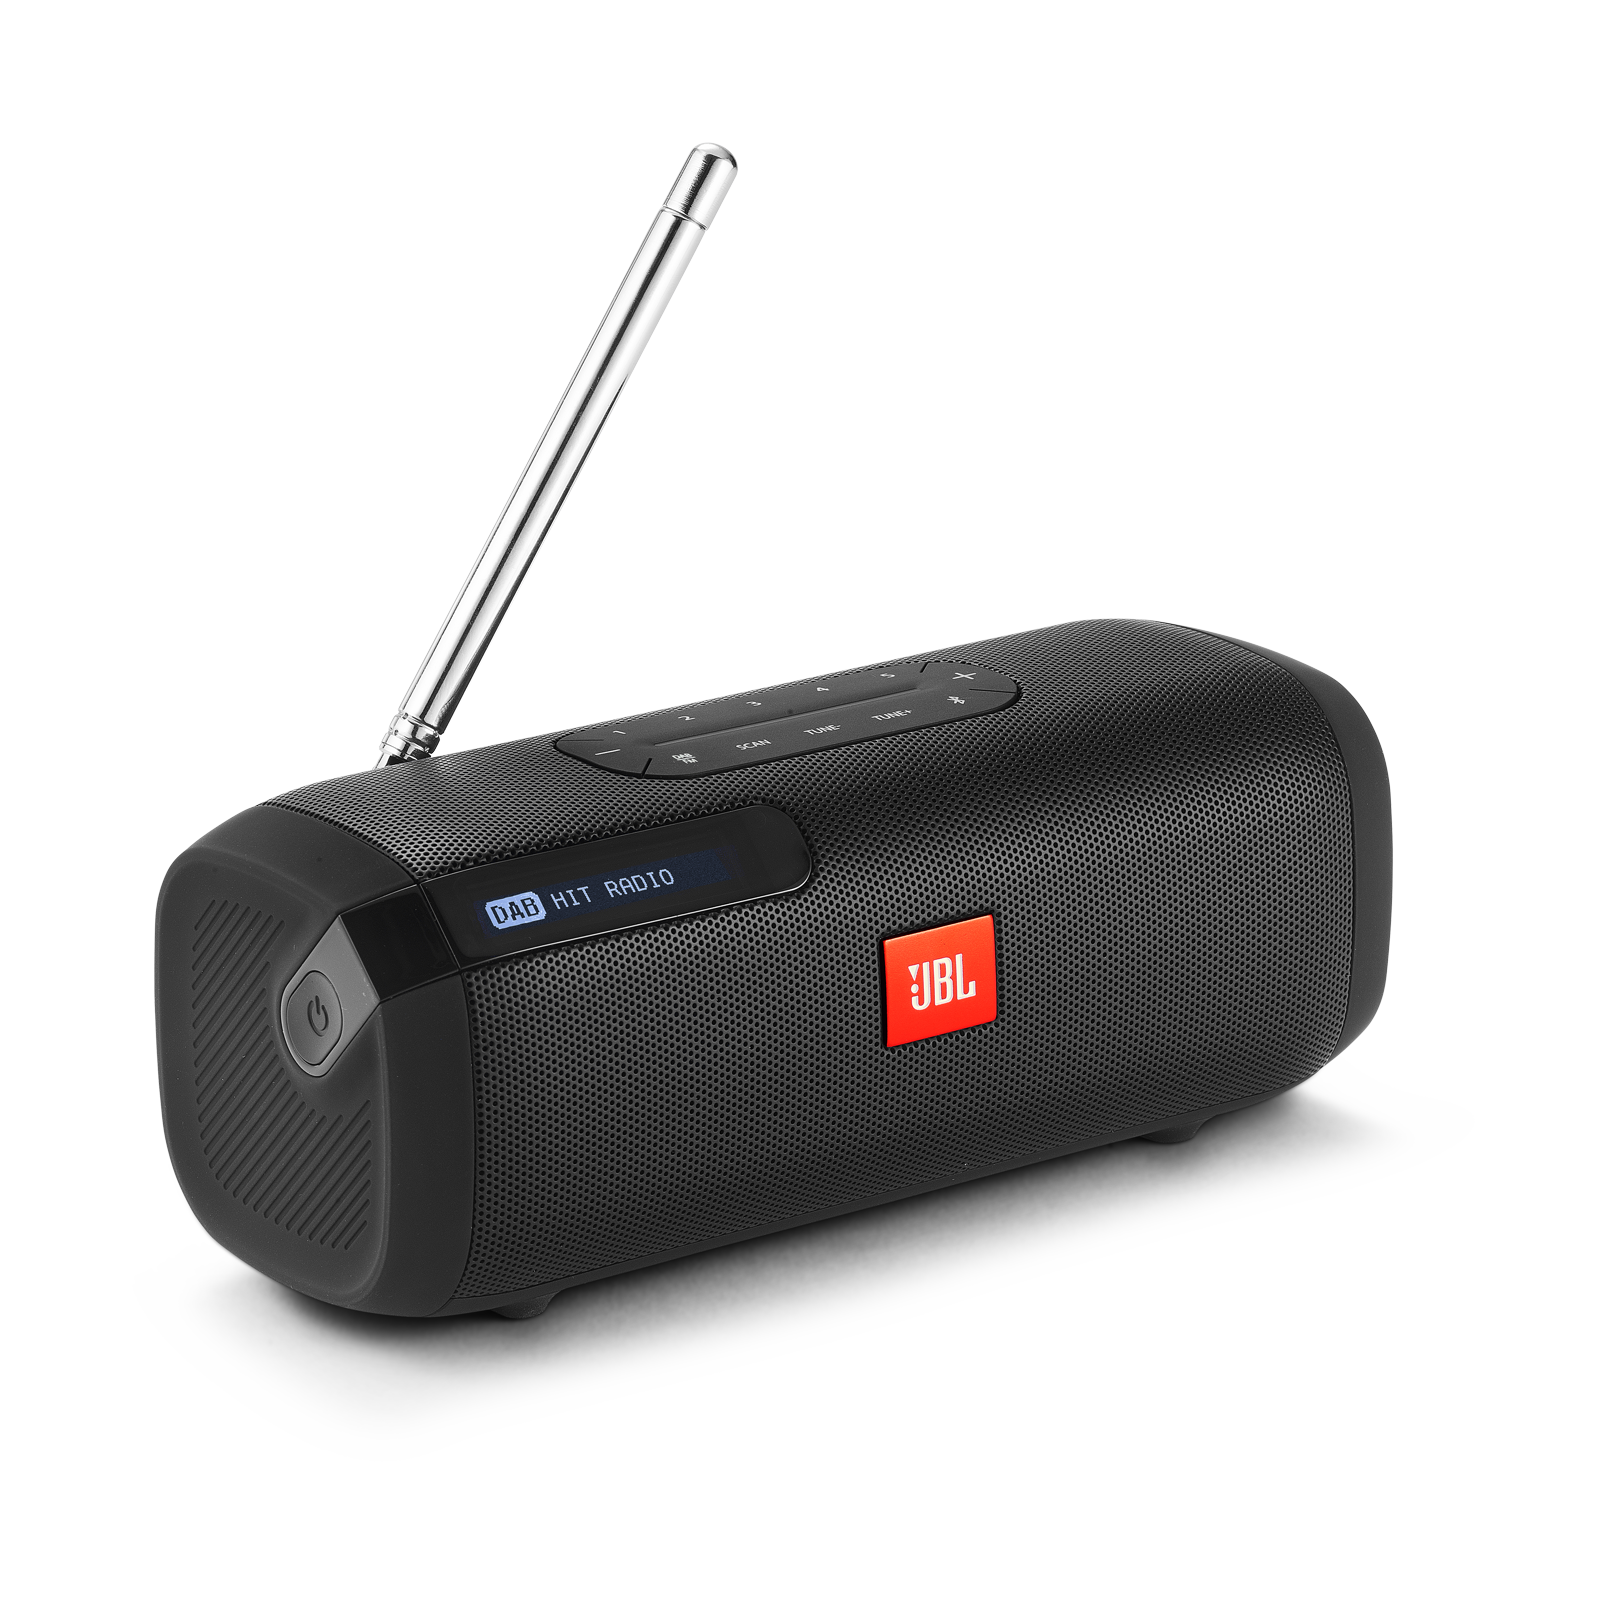 JBL Tuner - Black - Portable Bluetooth Speaker with DAB/FM radio - Hero